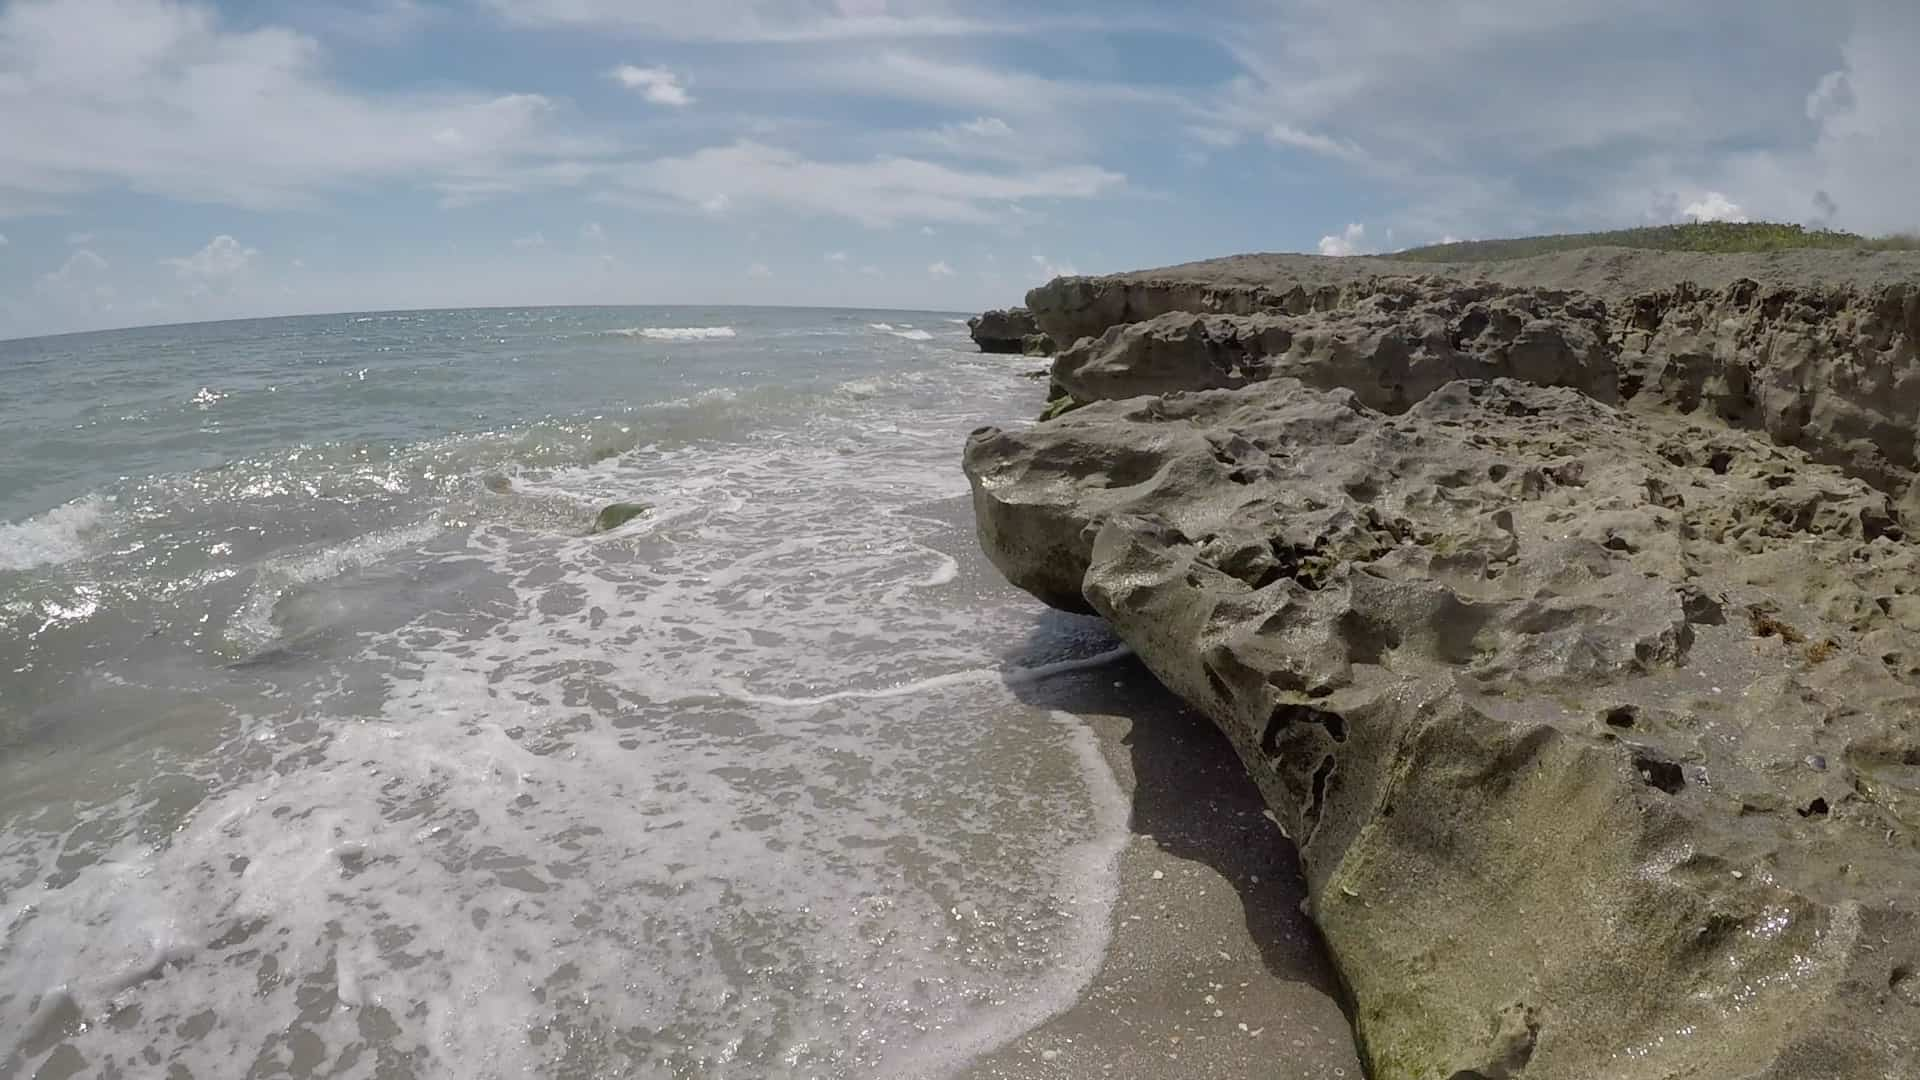 Blowing Rocks Preserve Provides A Close Up Look At Florida